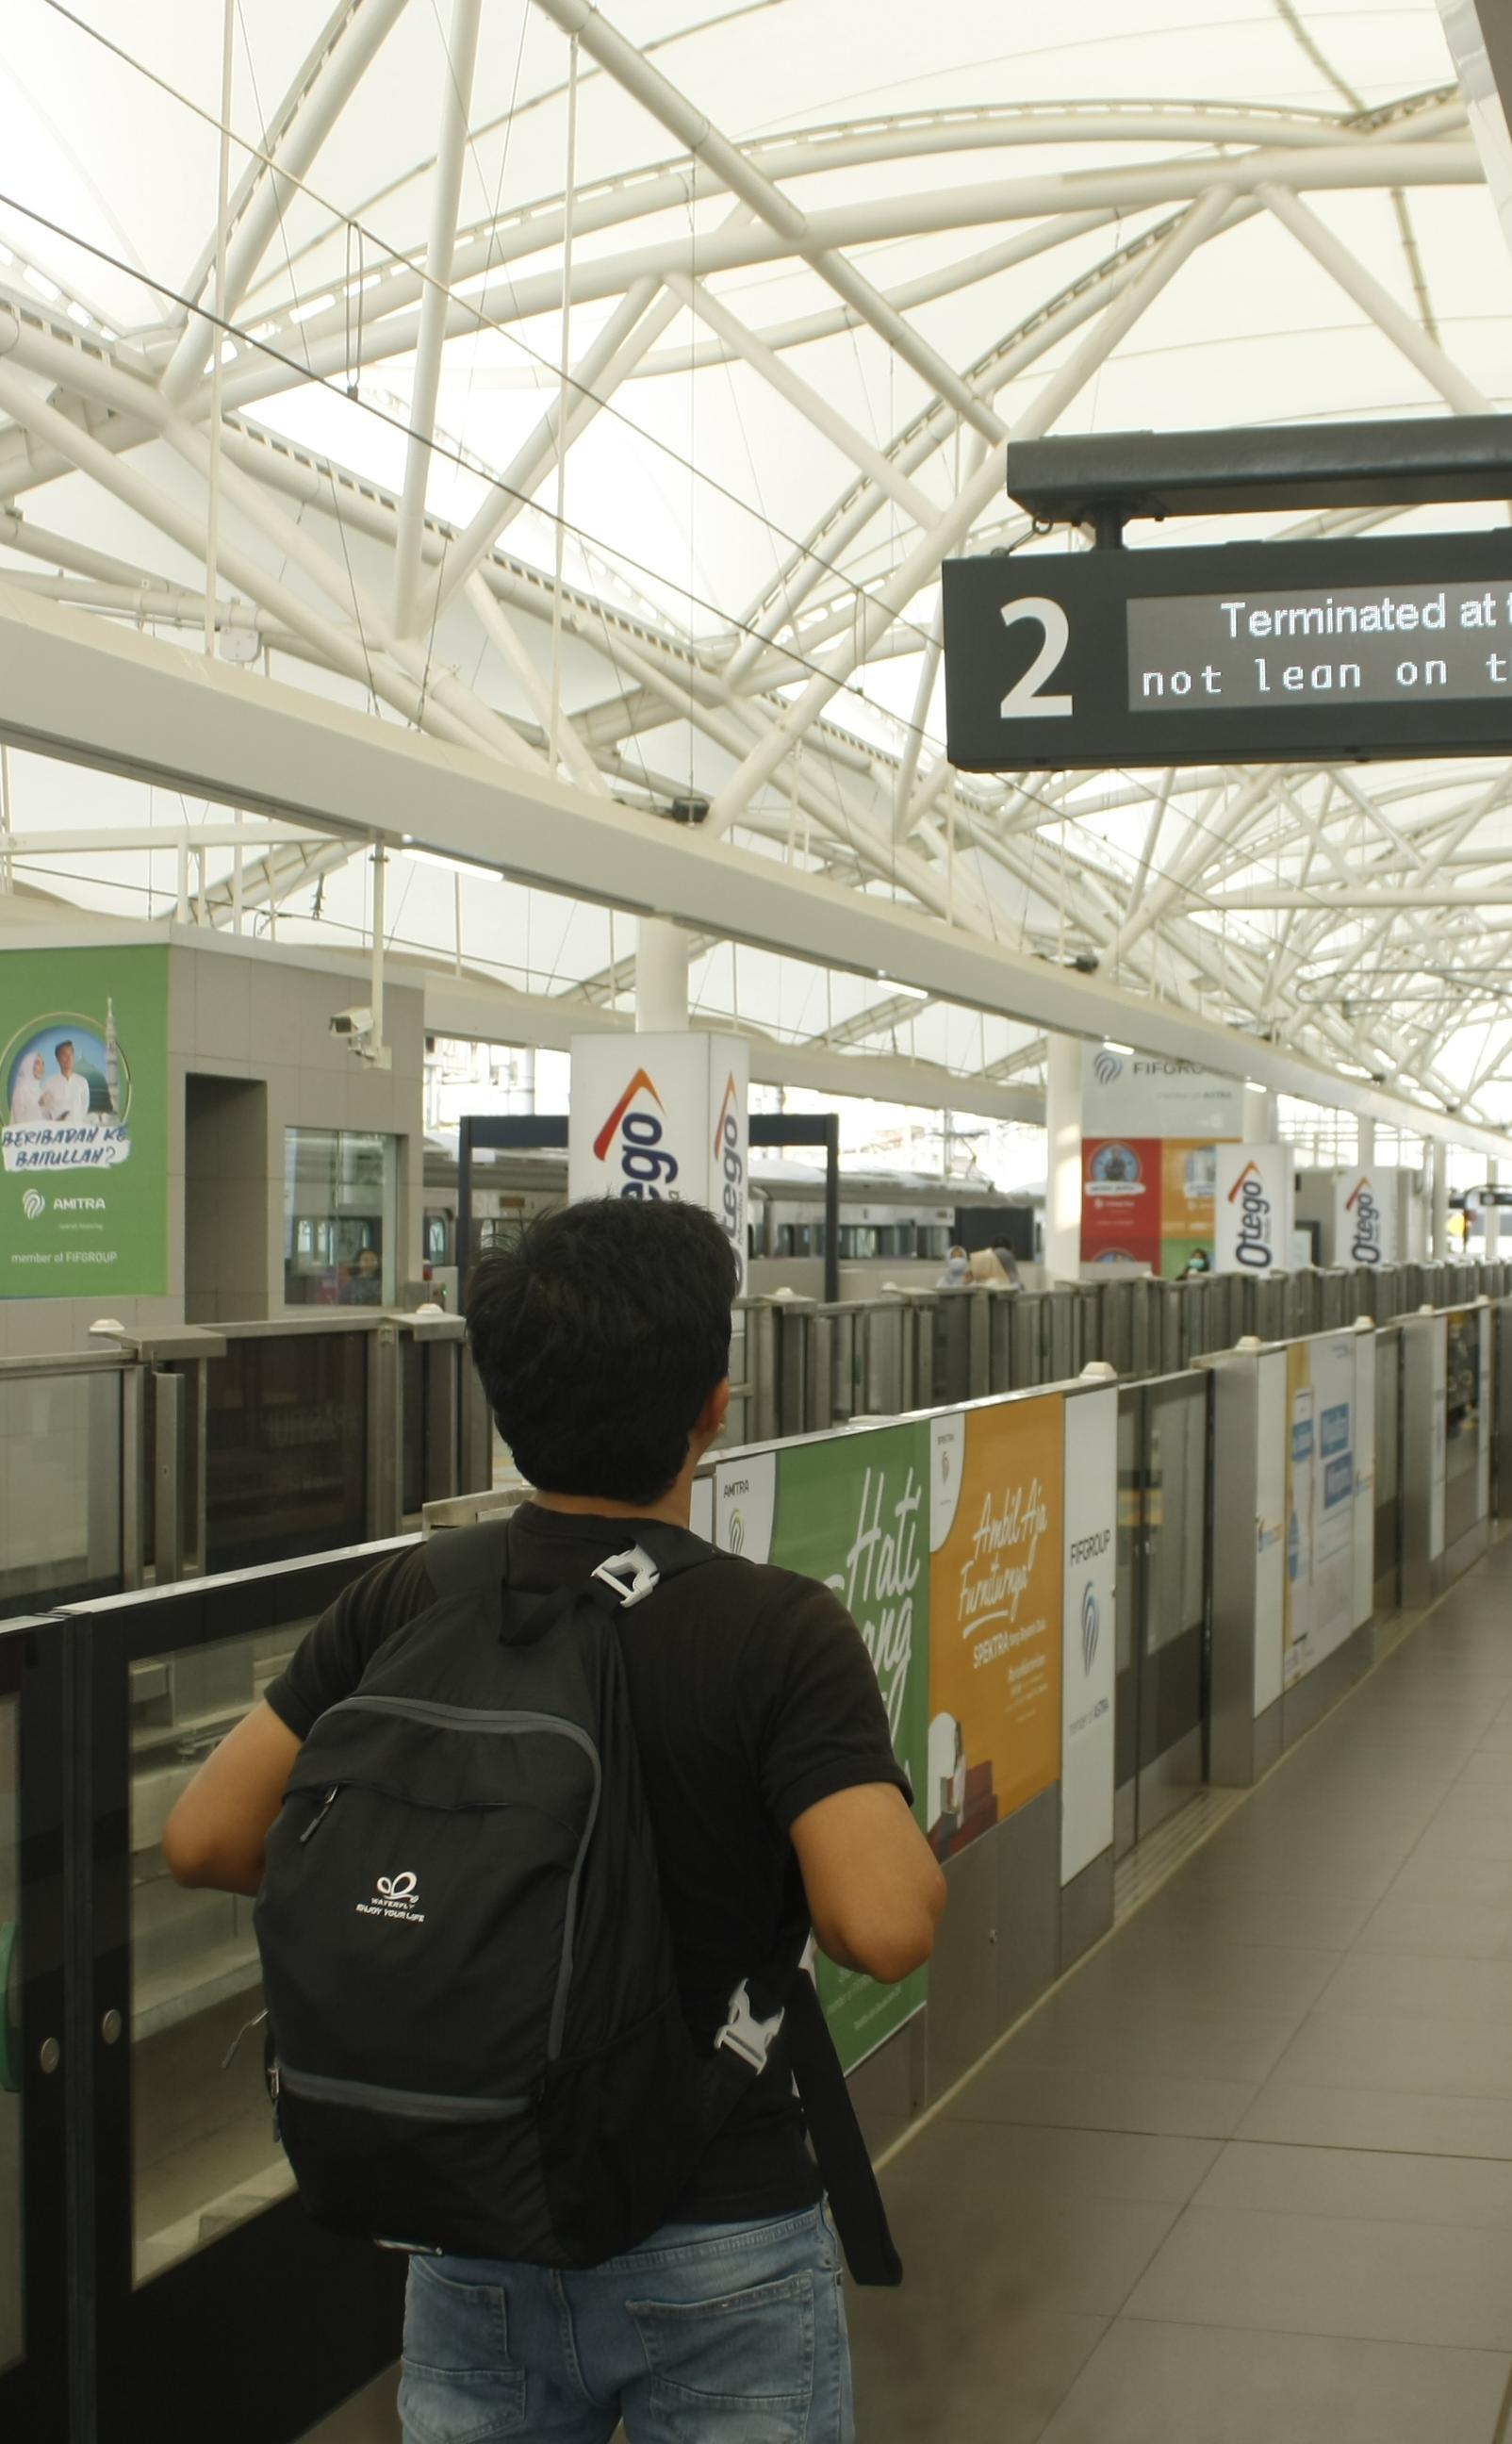 Favehotel Melawai Hotel Murah Dekat Stasiun Mrt Blok M Jakarta Selatan 5 The Travelearn